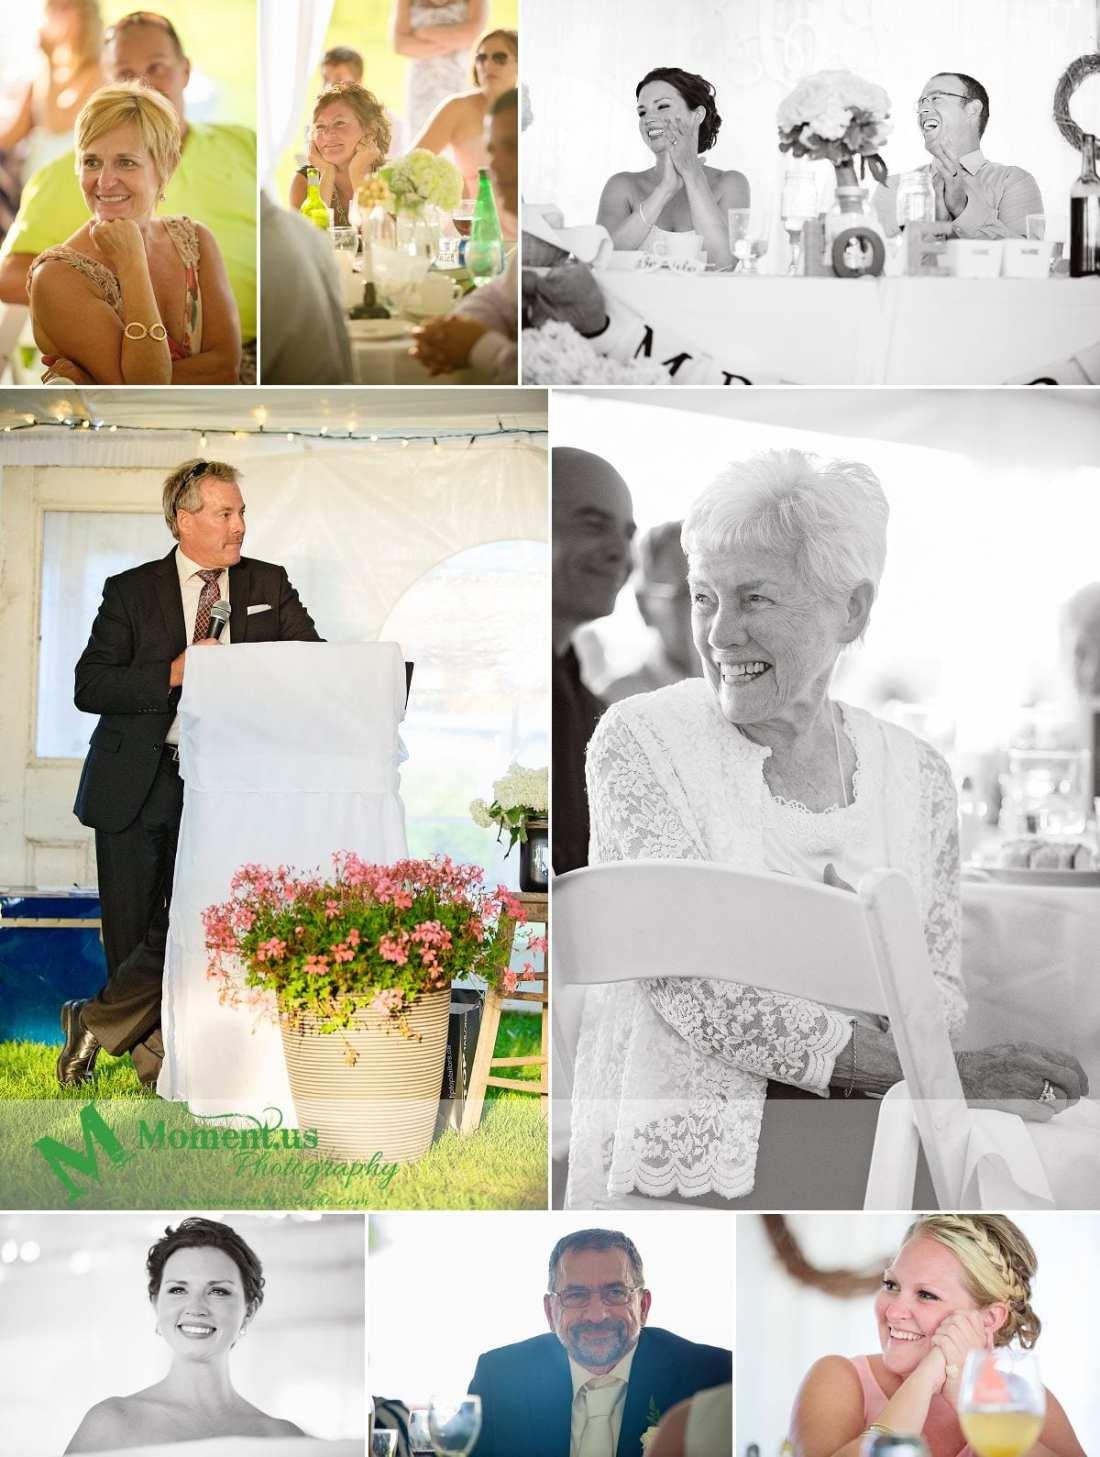 Outdoor Cornwall Wedding - father of groom giving speech